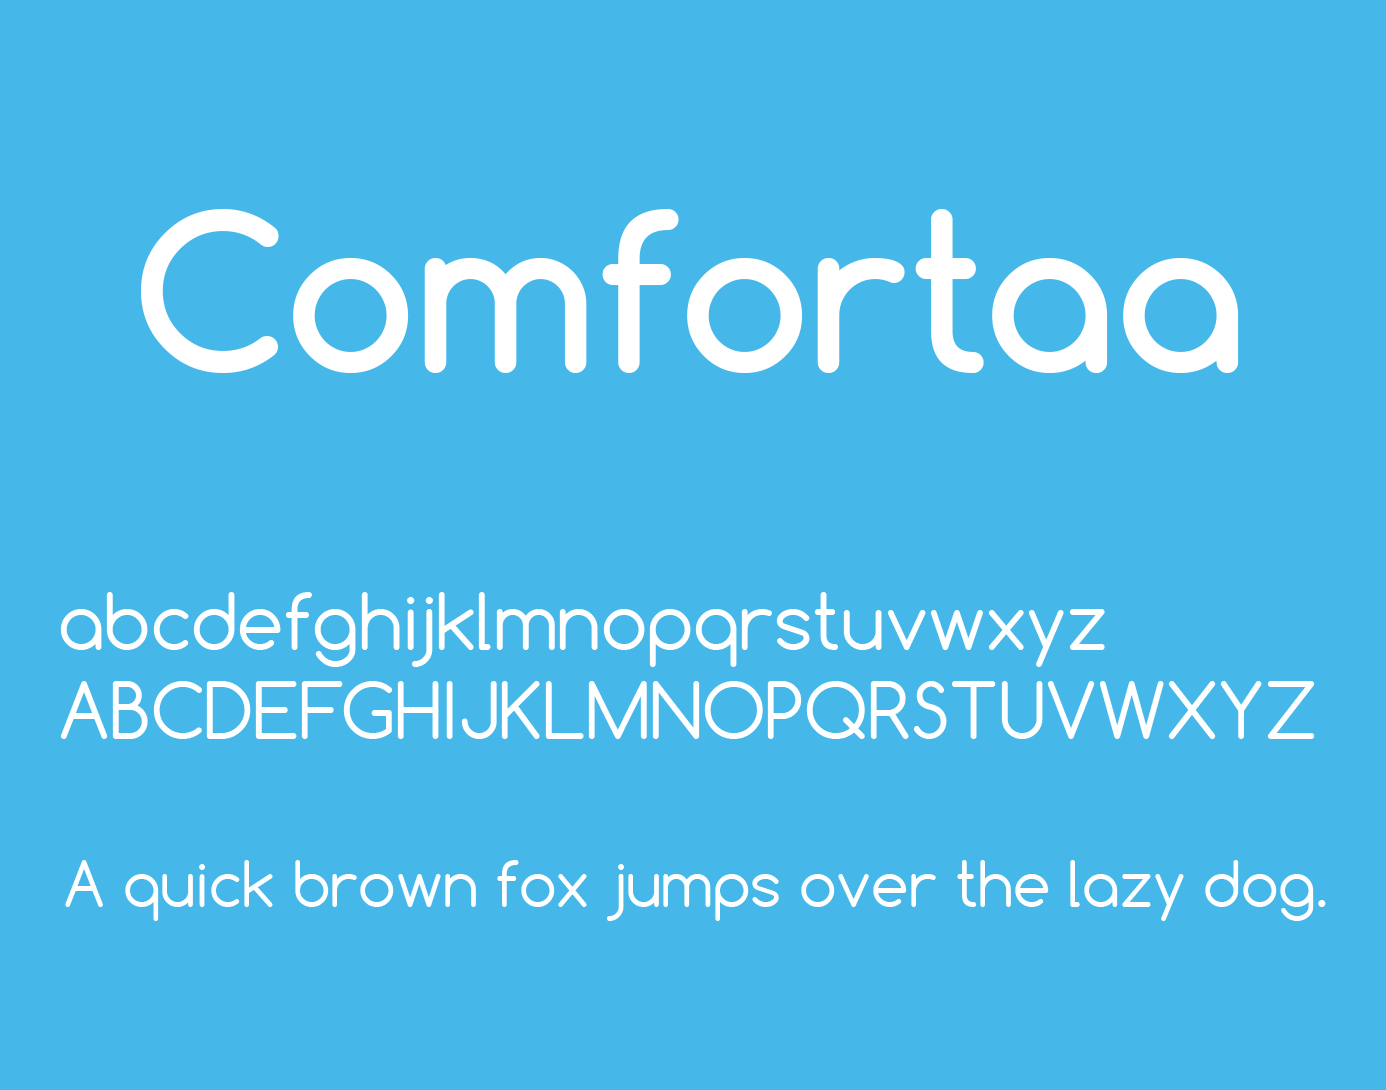 https://fontclarity.com/wp-content/uploads/2019/09/comfortaa-font-download-0.png Free Download